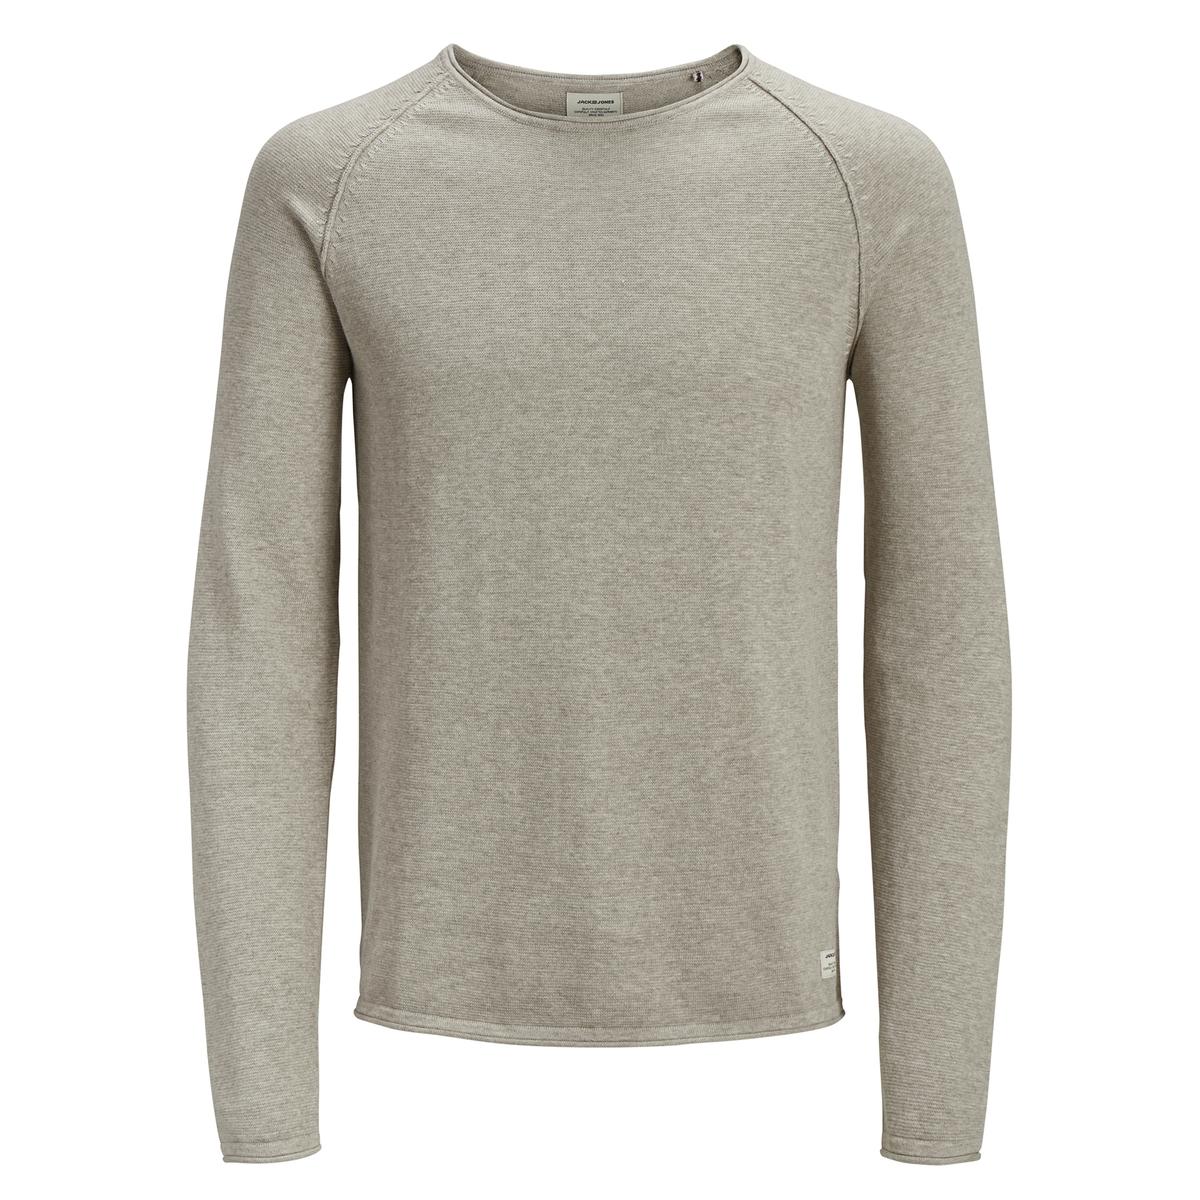 Пуловер La Redoute С круглым вырезом из тонкого трикотажа XXL бежевый